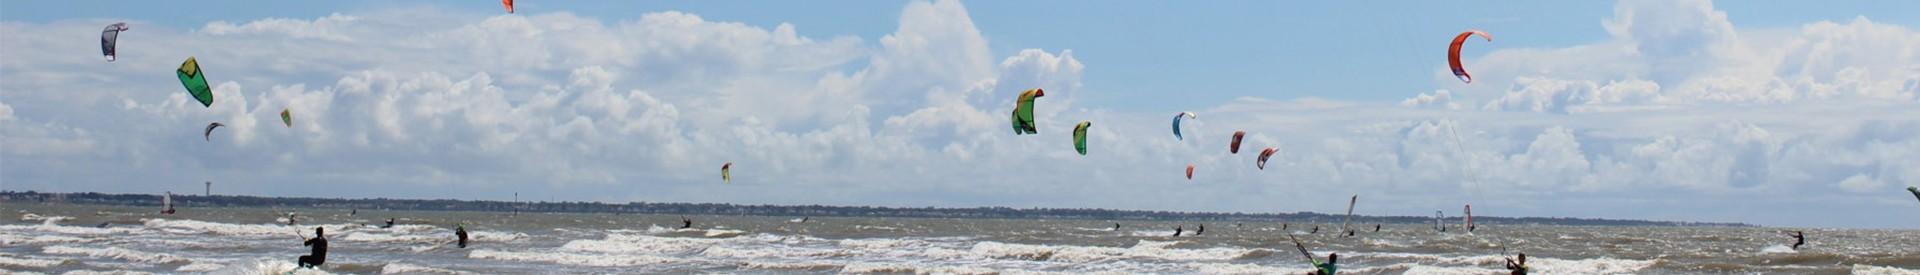 header-kite-stbrevin-261